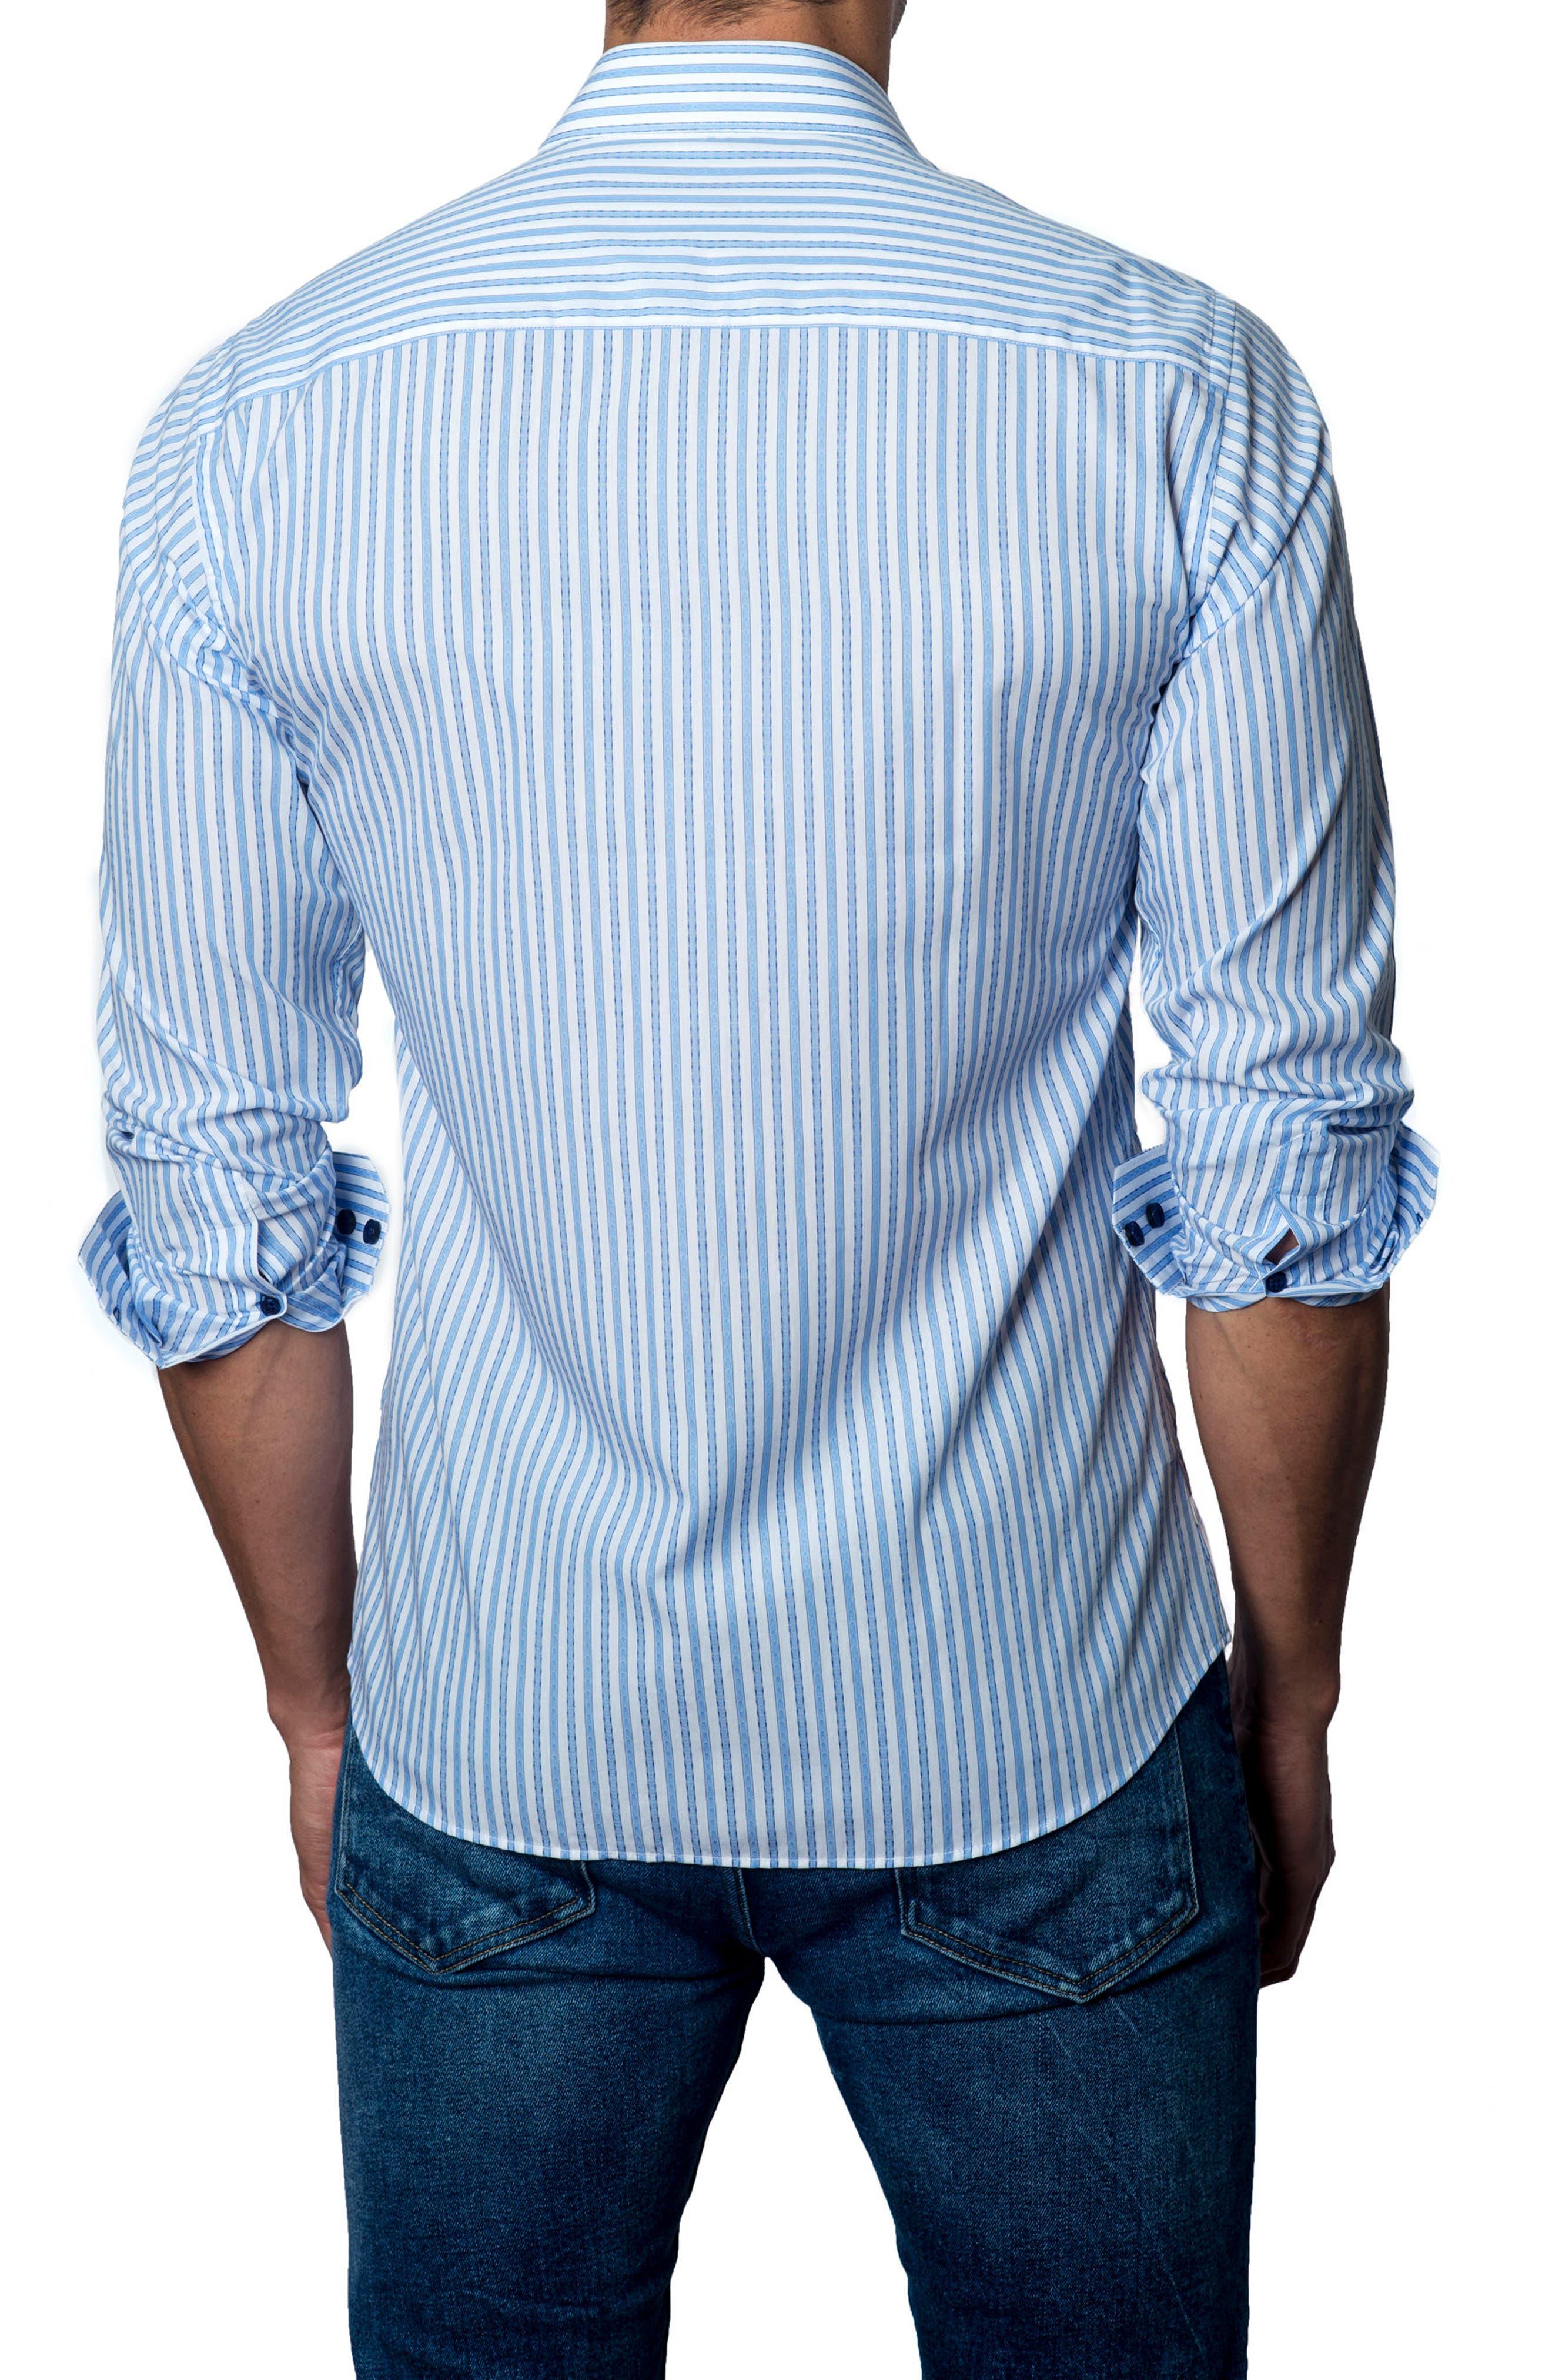 Trim Fit Stripe Sport Shirt,                             Alternate thumbnail 2, color,                             Light Blue / White Stripe